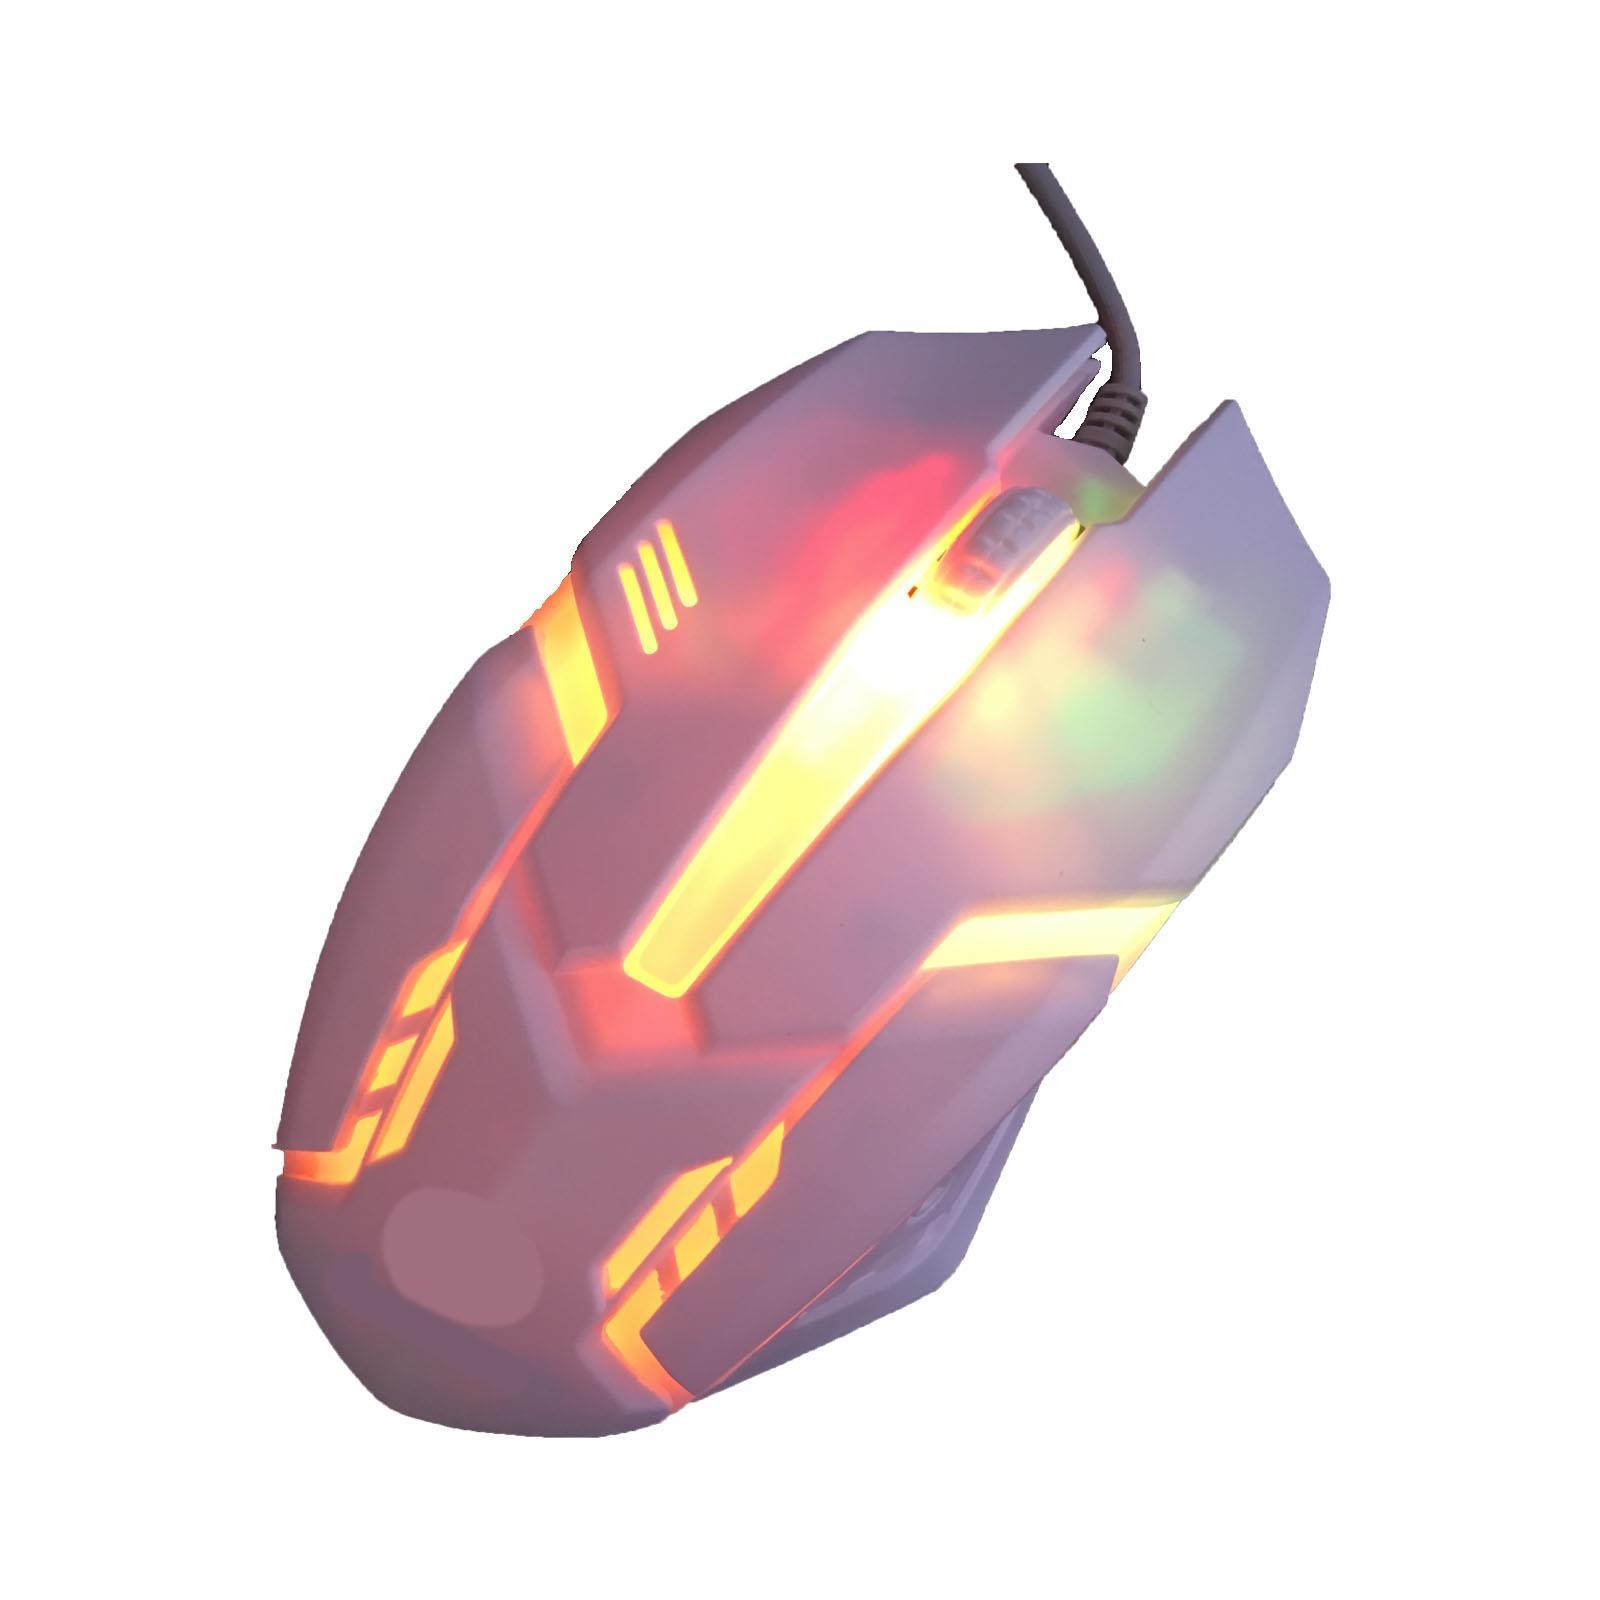 Gaming-Keyboard-Mouse-Backlit-Rainbow-LED-USB-Set-for-PC-Laptop-PS4-Xbox-One thumbnail 29